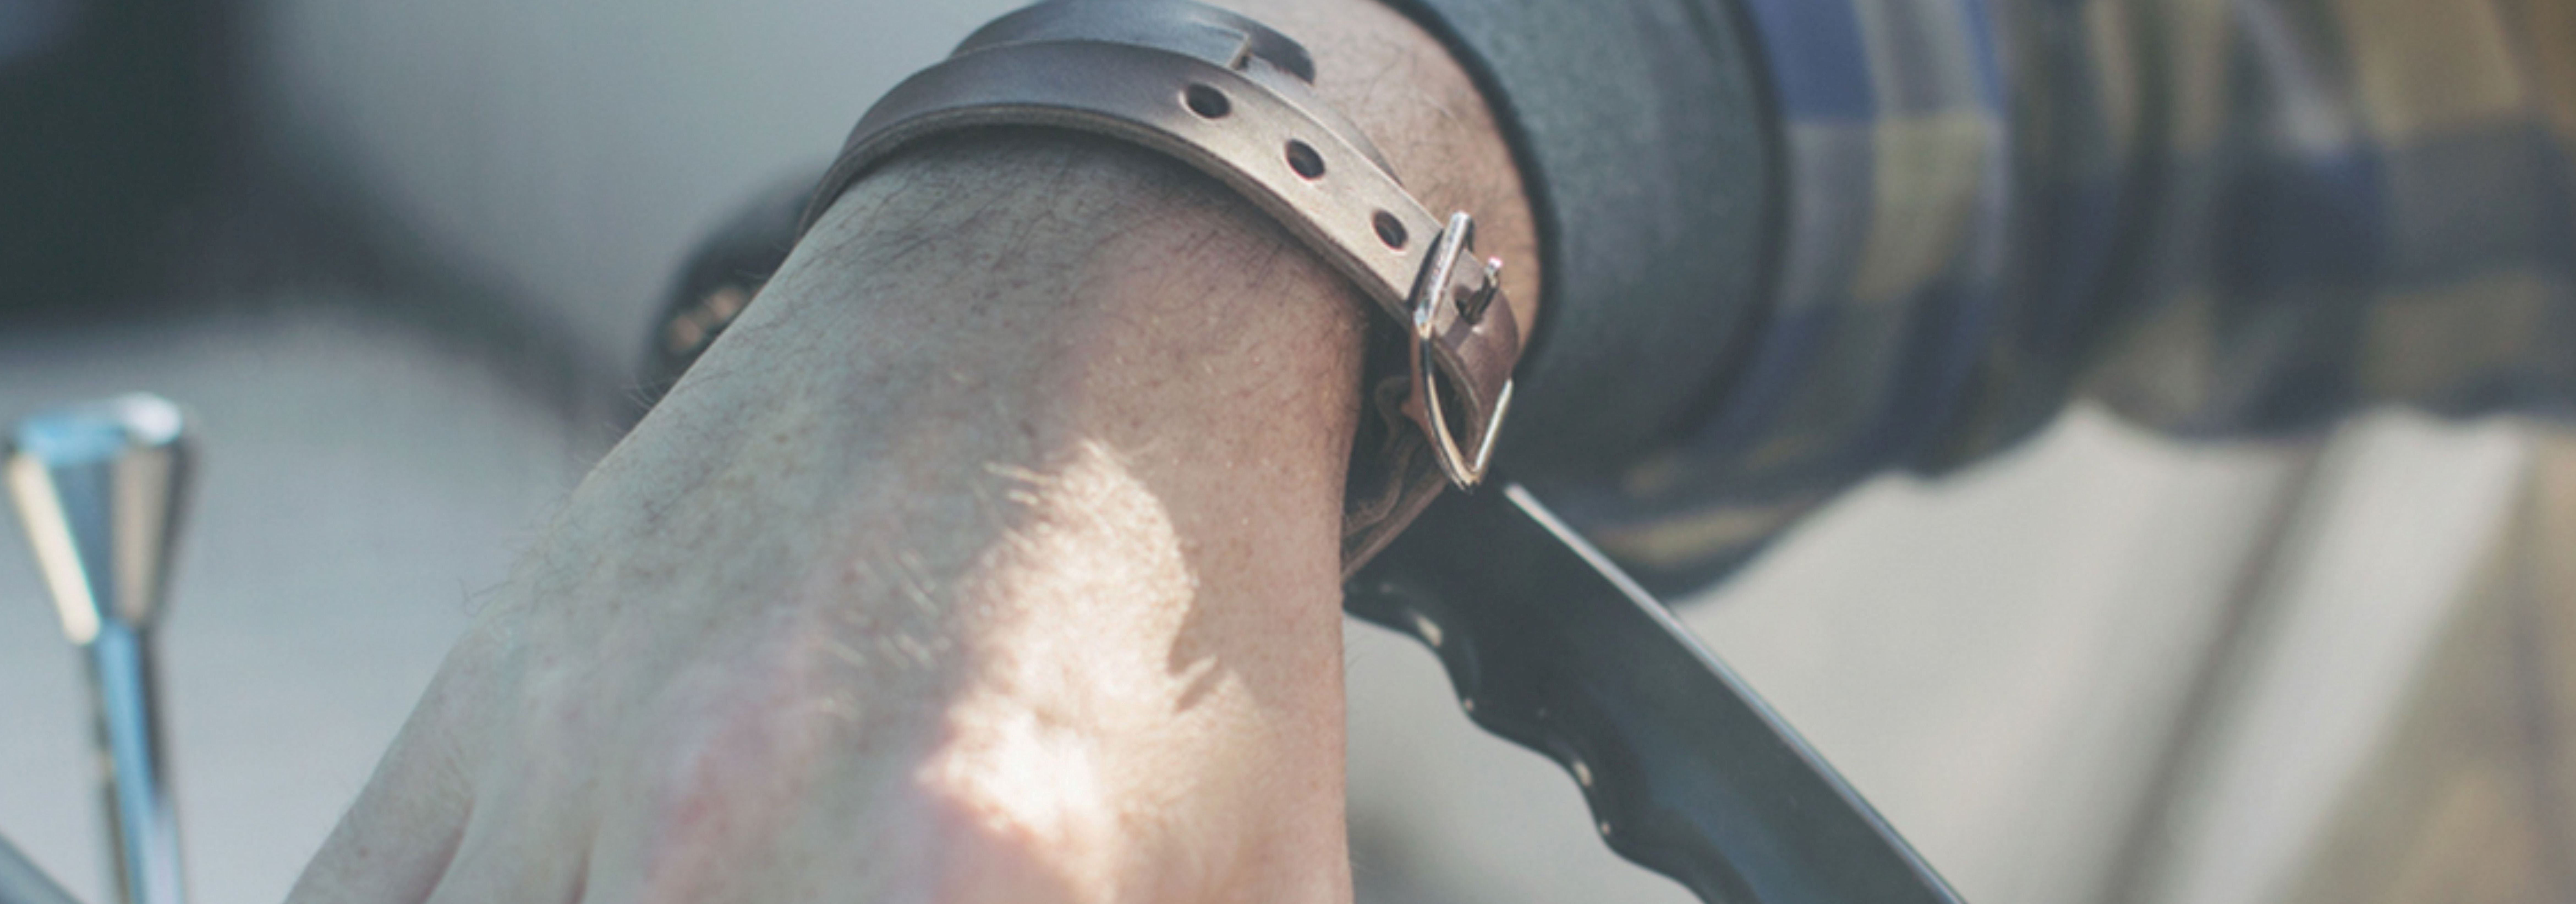 rustico-buckle-wrist-band.jpg